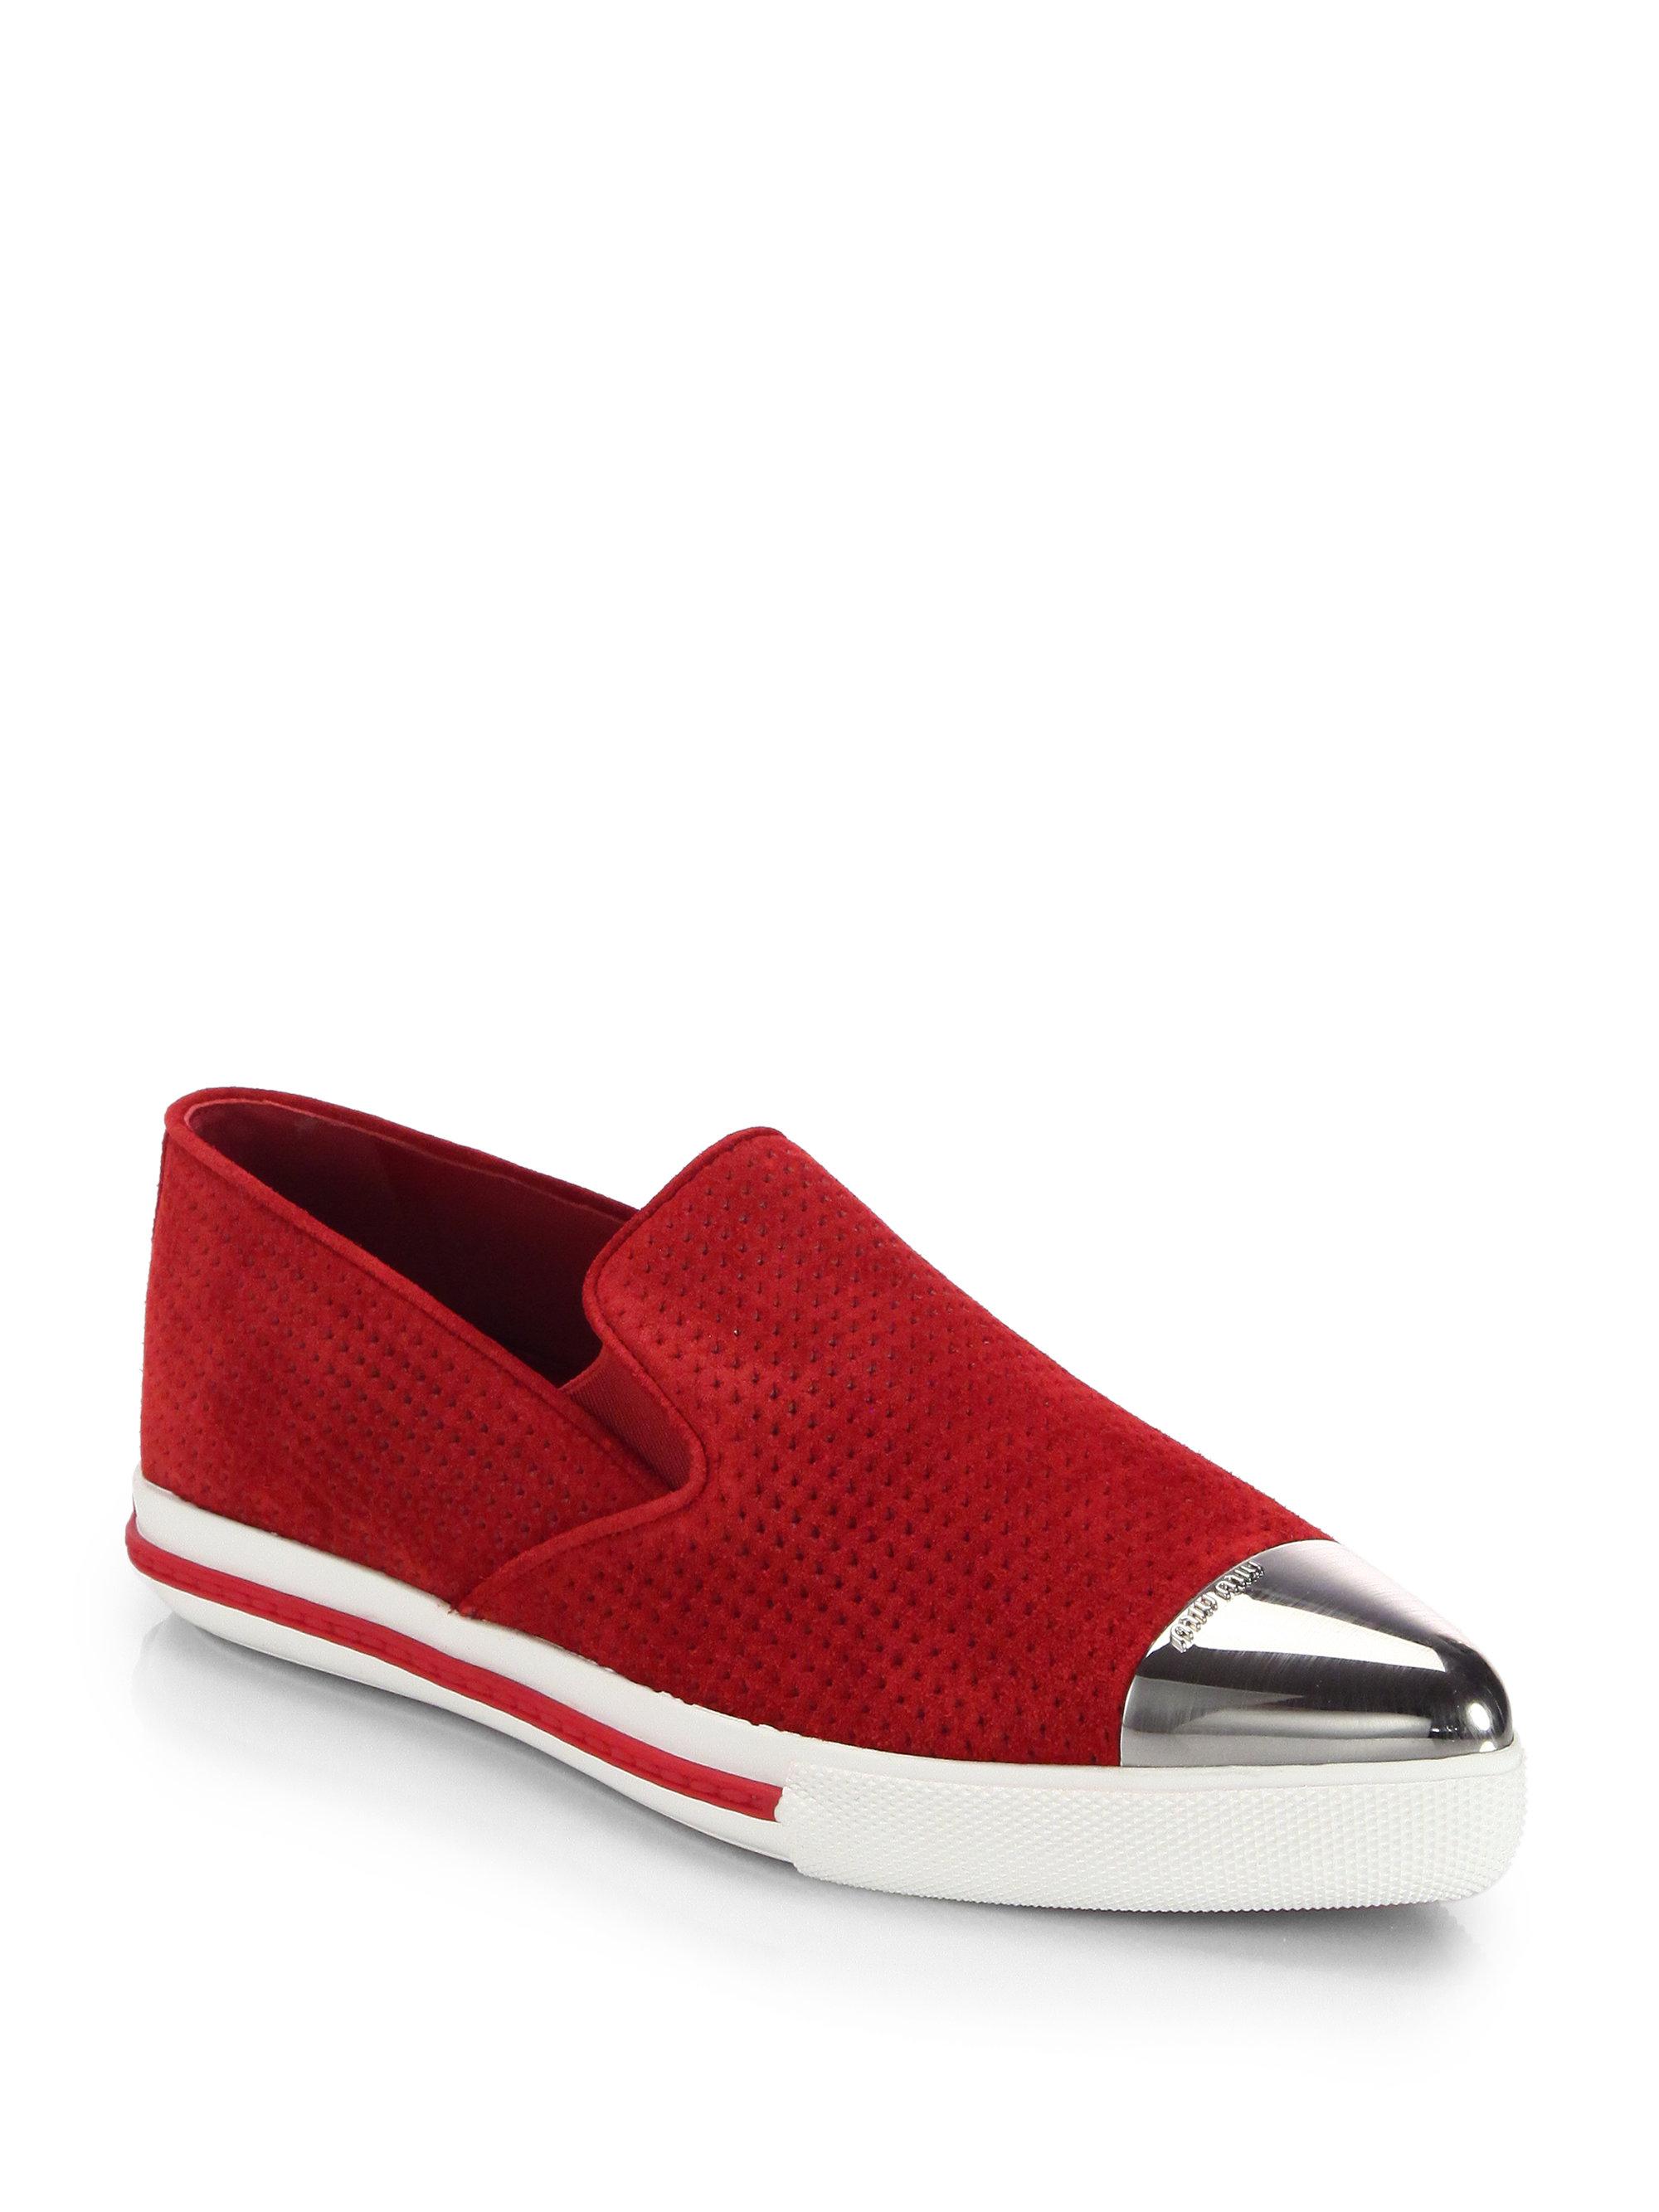 miu miu suede cap toe sneakers in red lyst. Black Bedroom Furniture Sets. Home Design Ideas